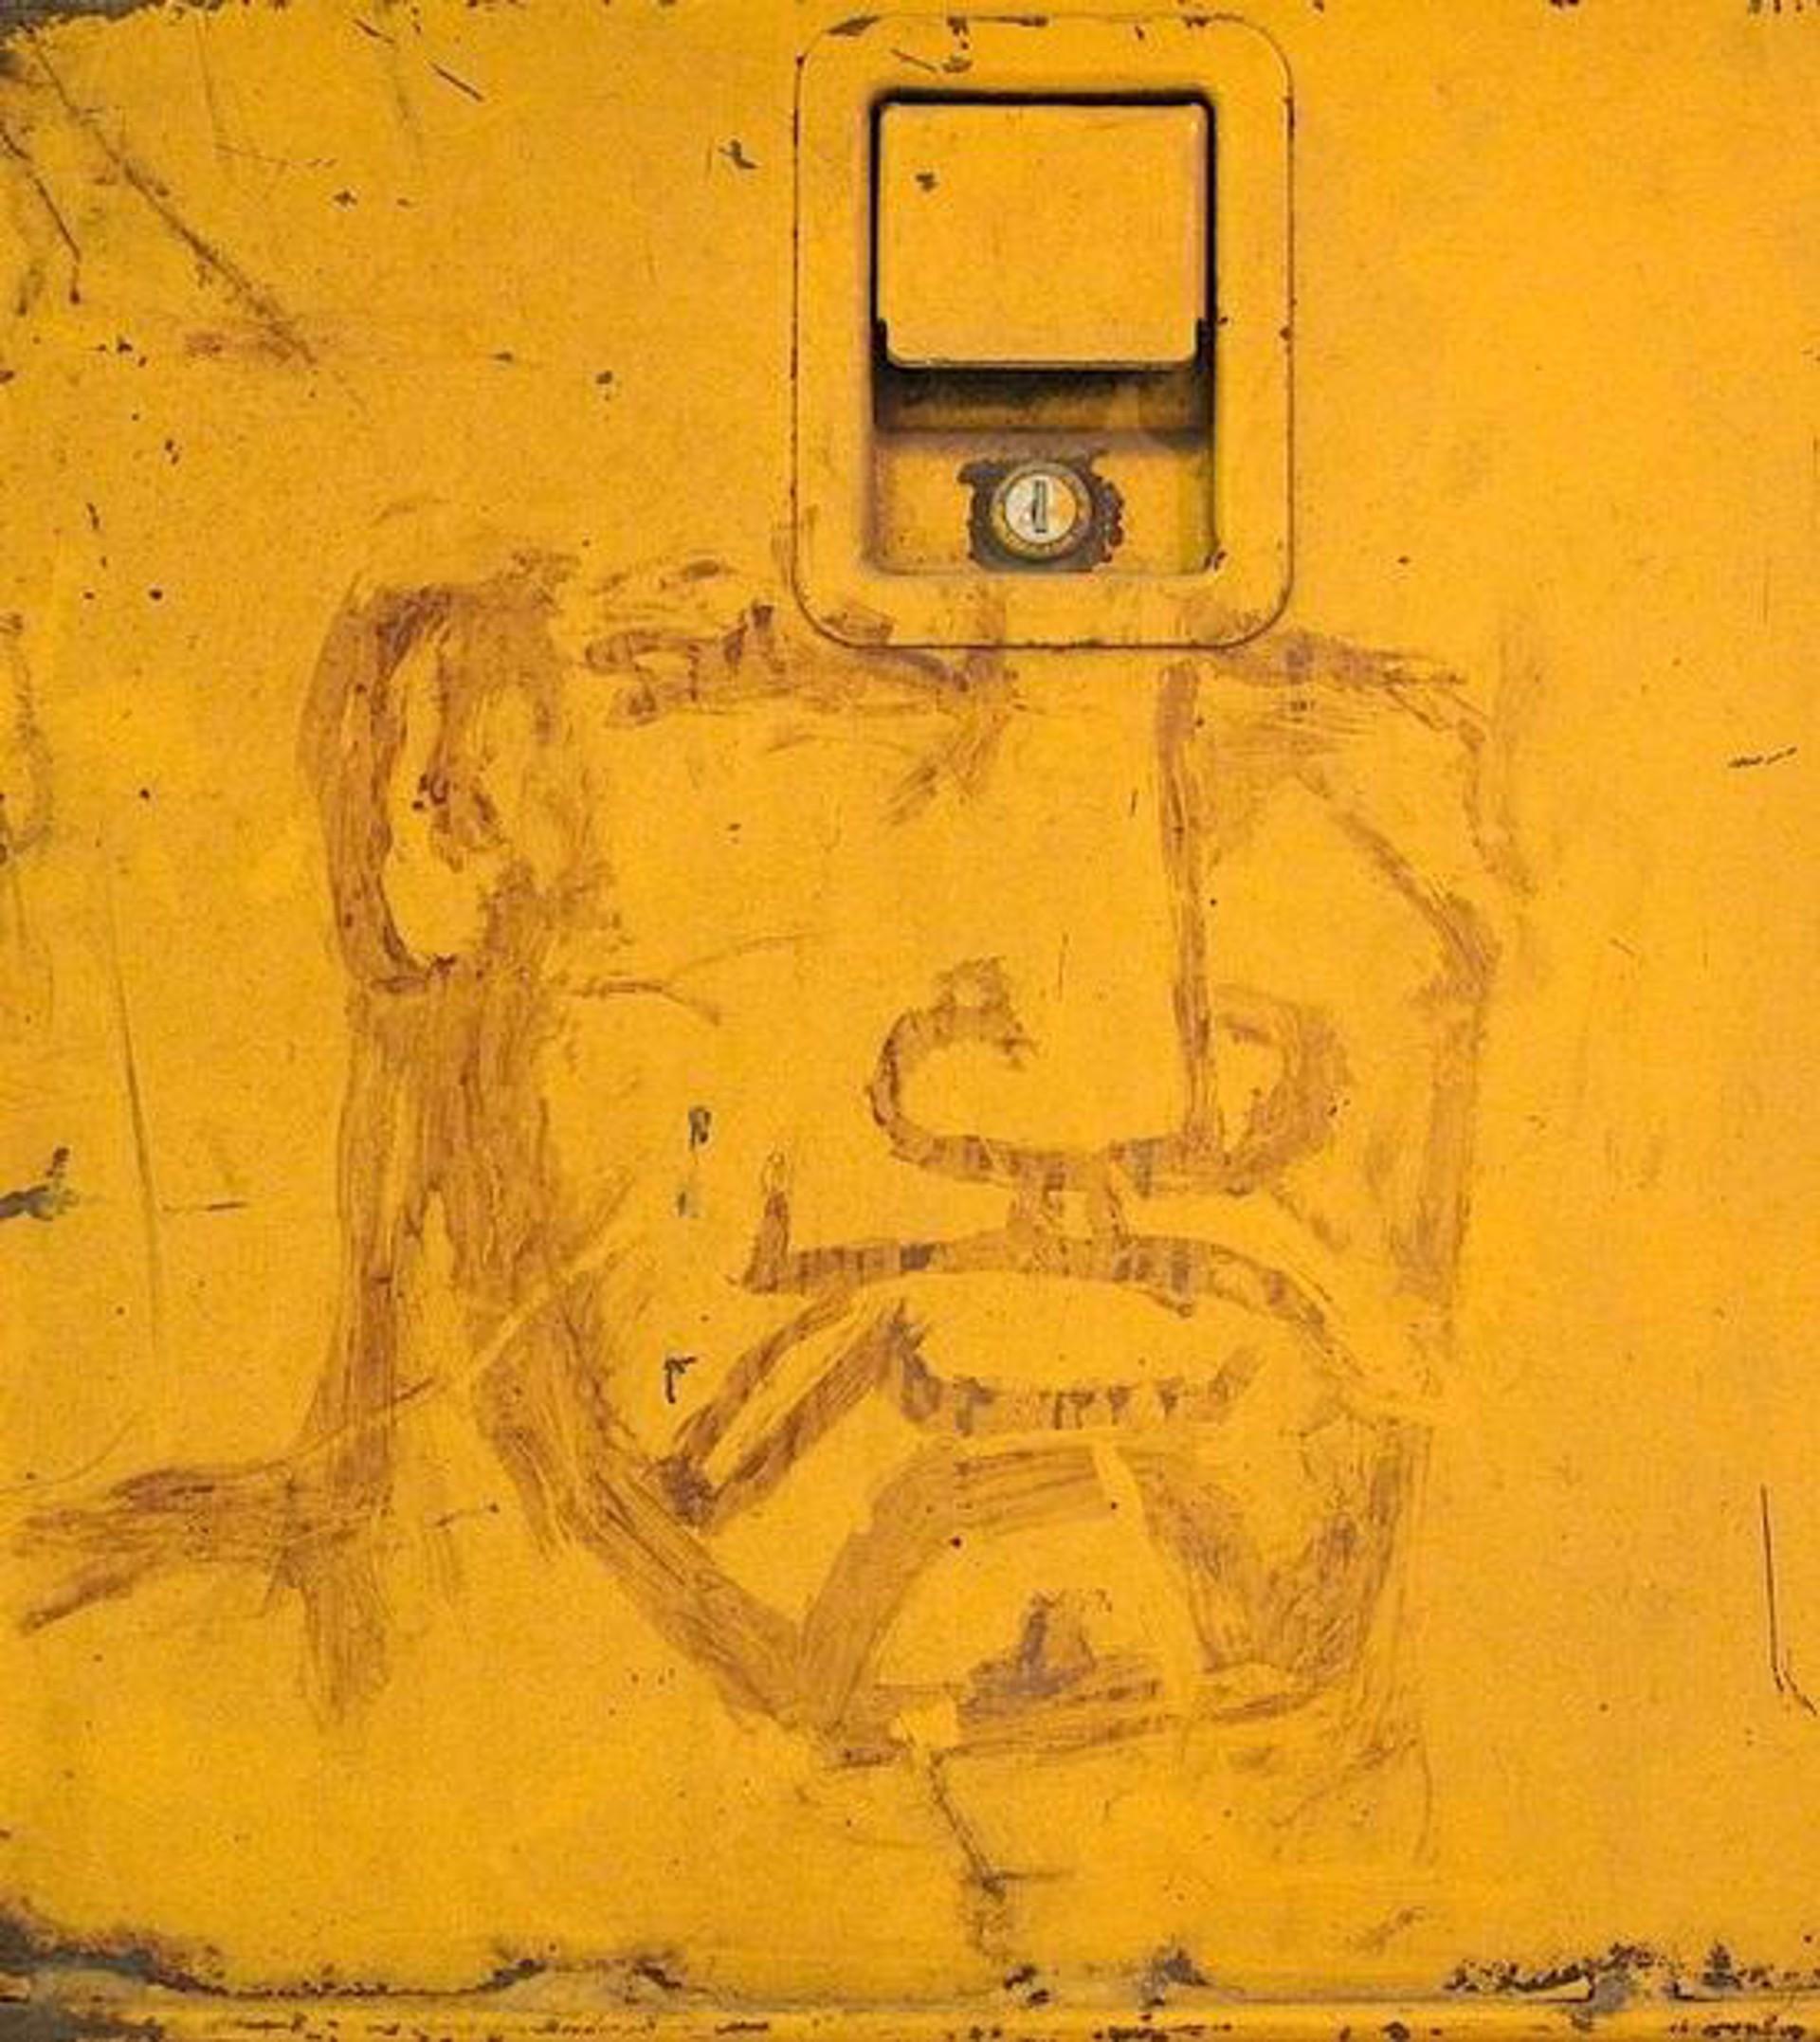 The Brute by Robert Loughlin